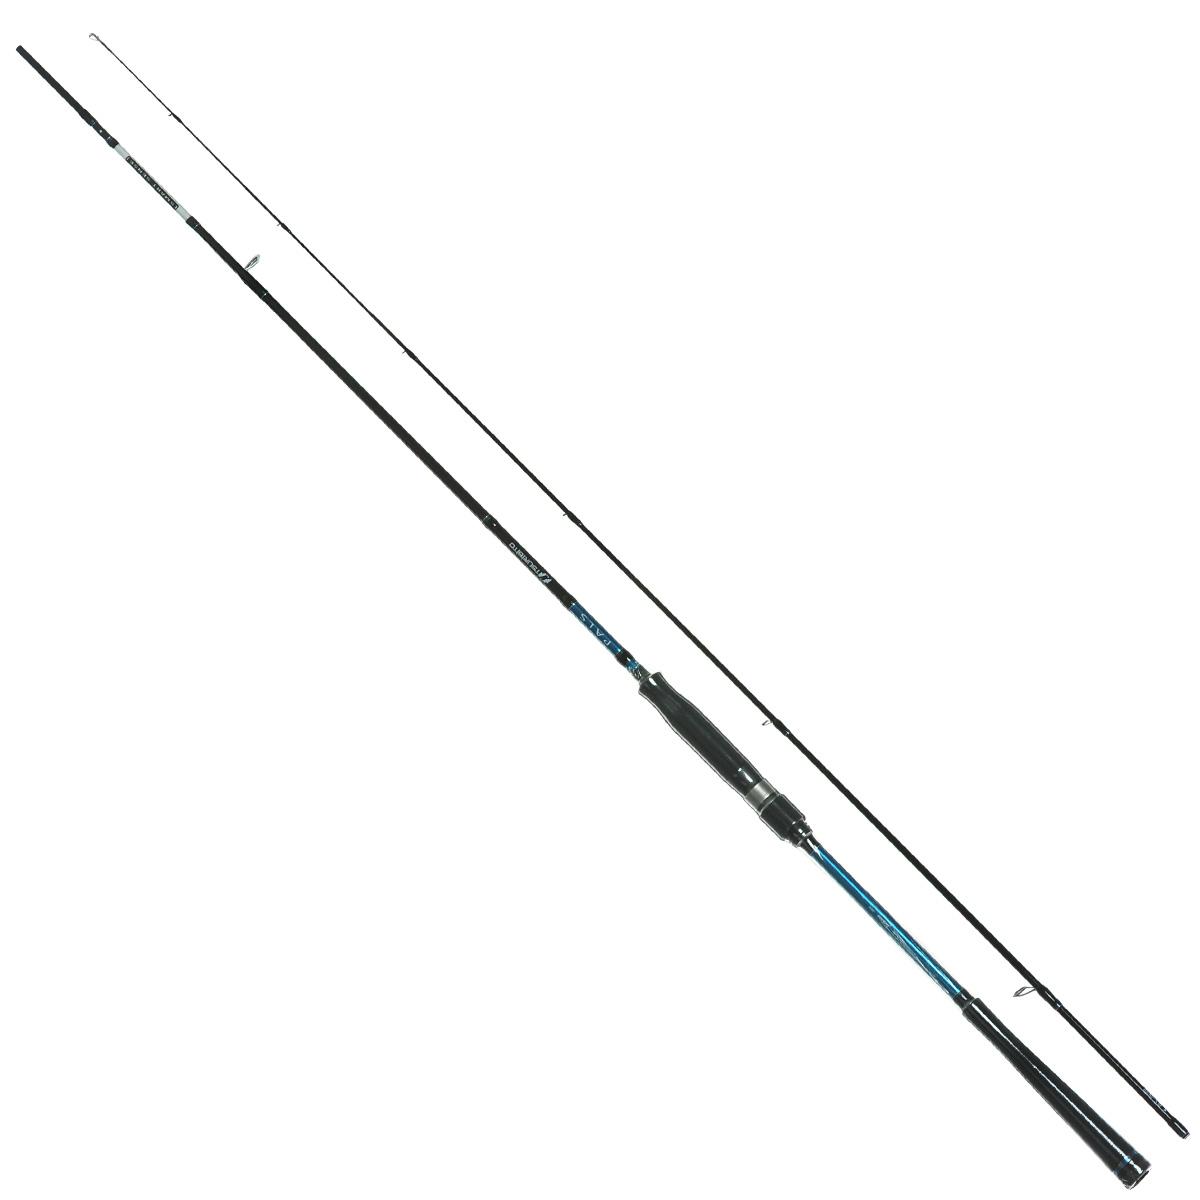 Удилище спиннинговое Tsuribito-Jackson Pals, 2,24 м, 6-20 г